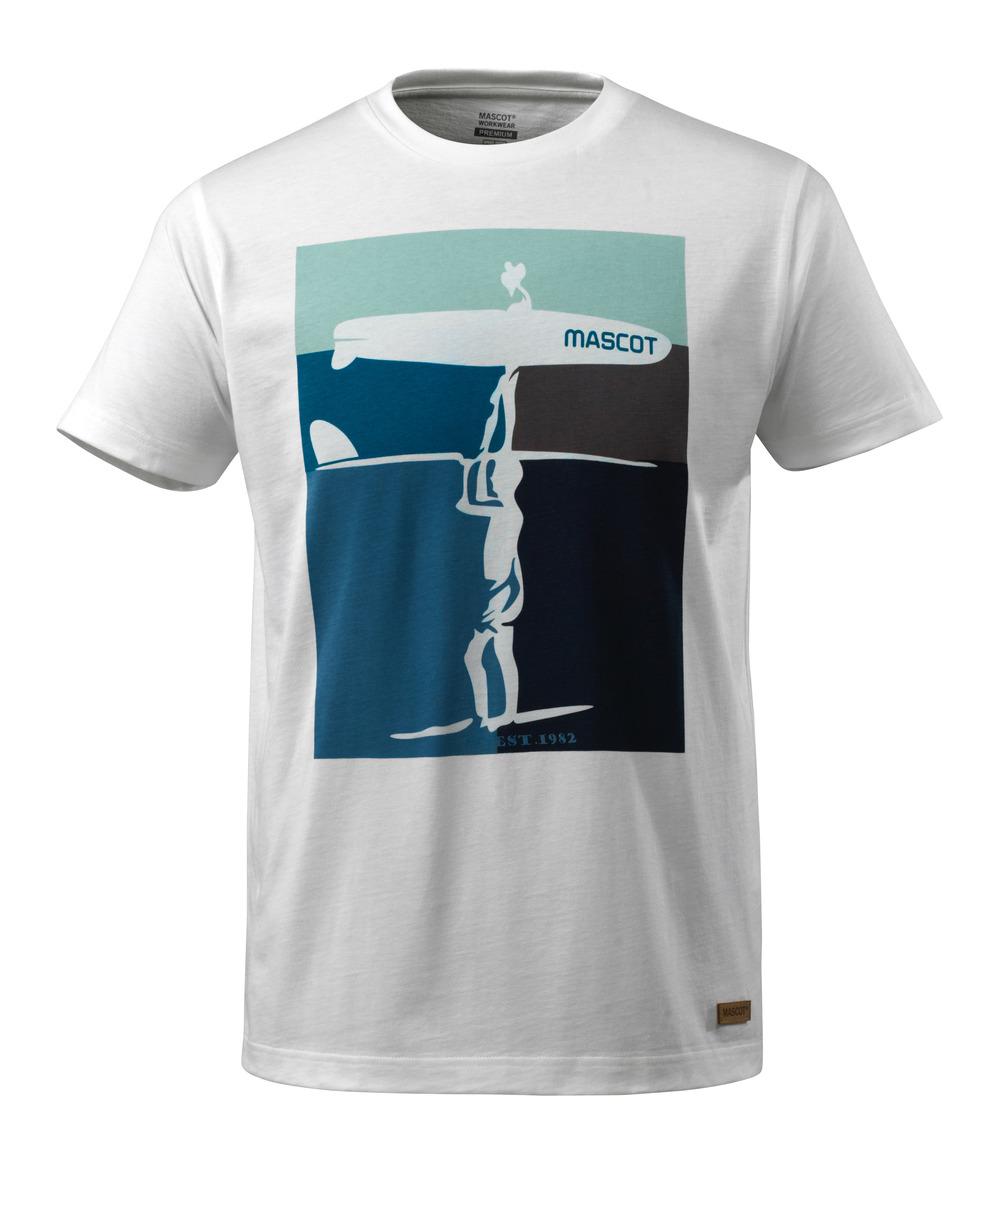 17182-250-06 Camiseta - blanco